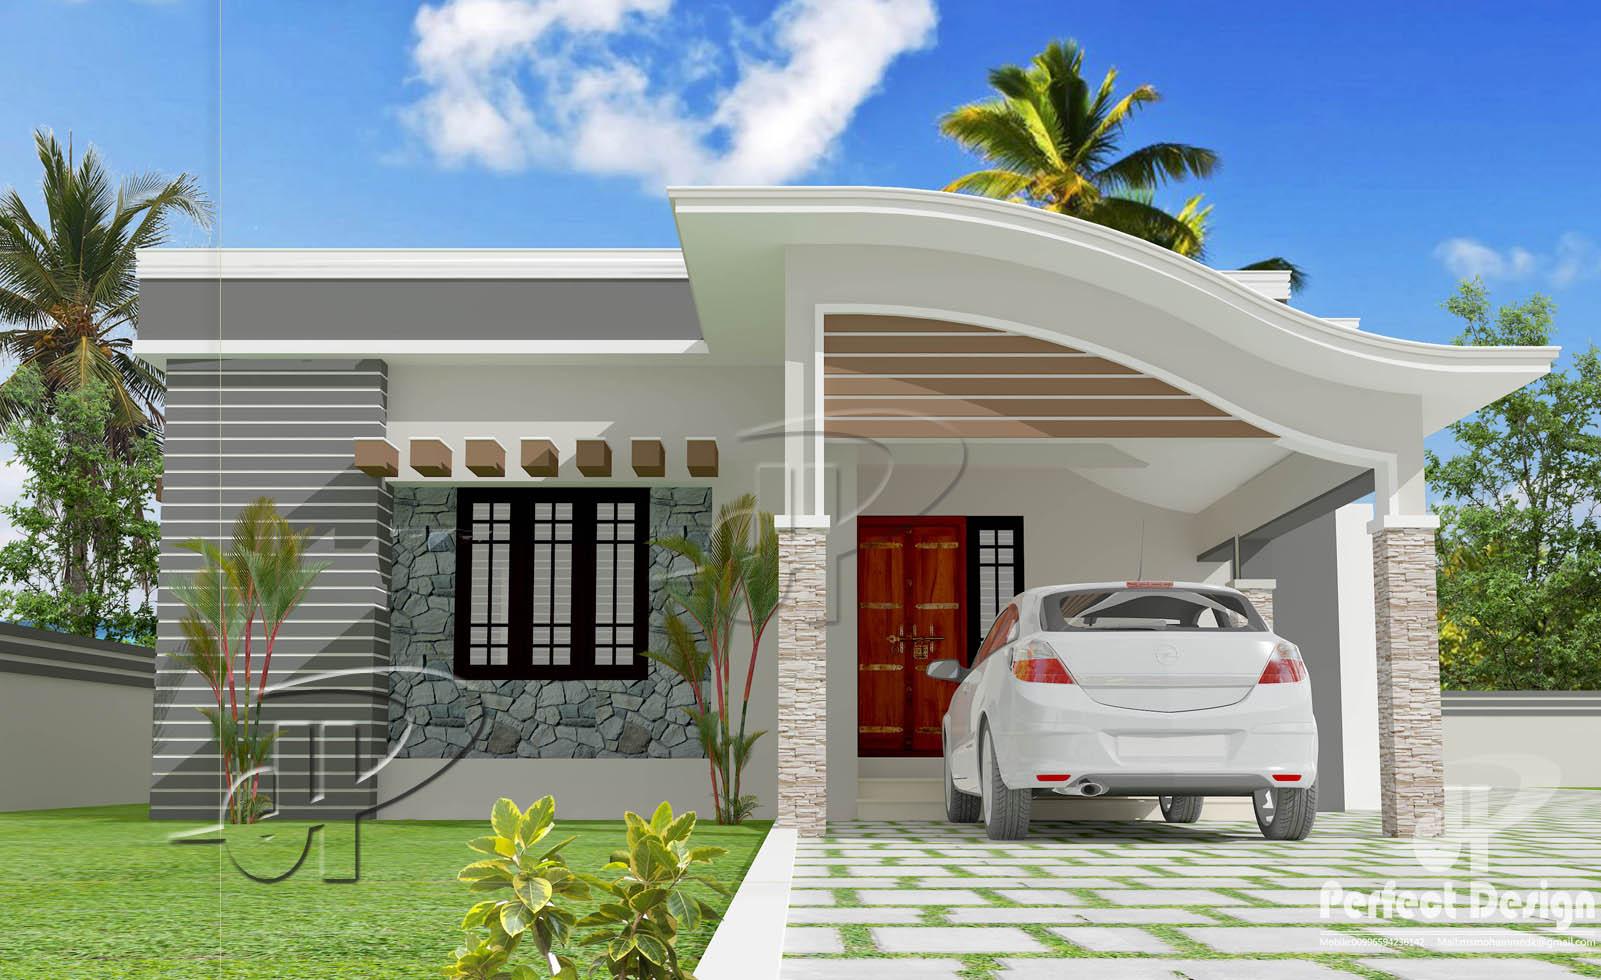 Car Porch Design Top Car Port Google Search With Car